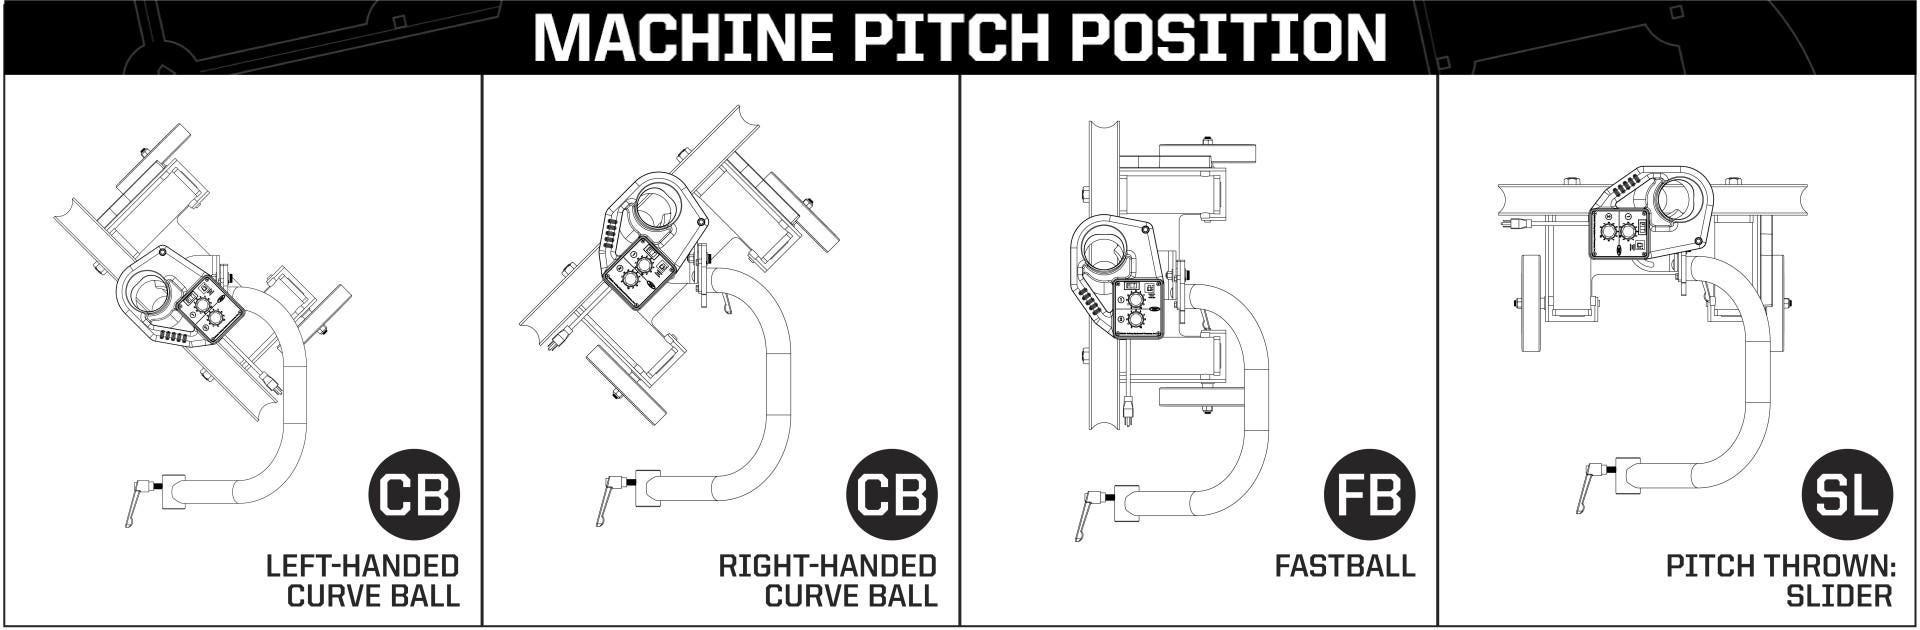 M2 Softball Pitching Machine